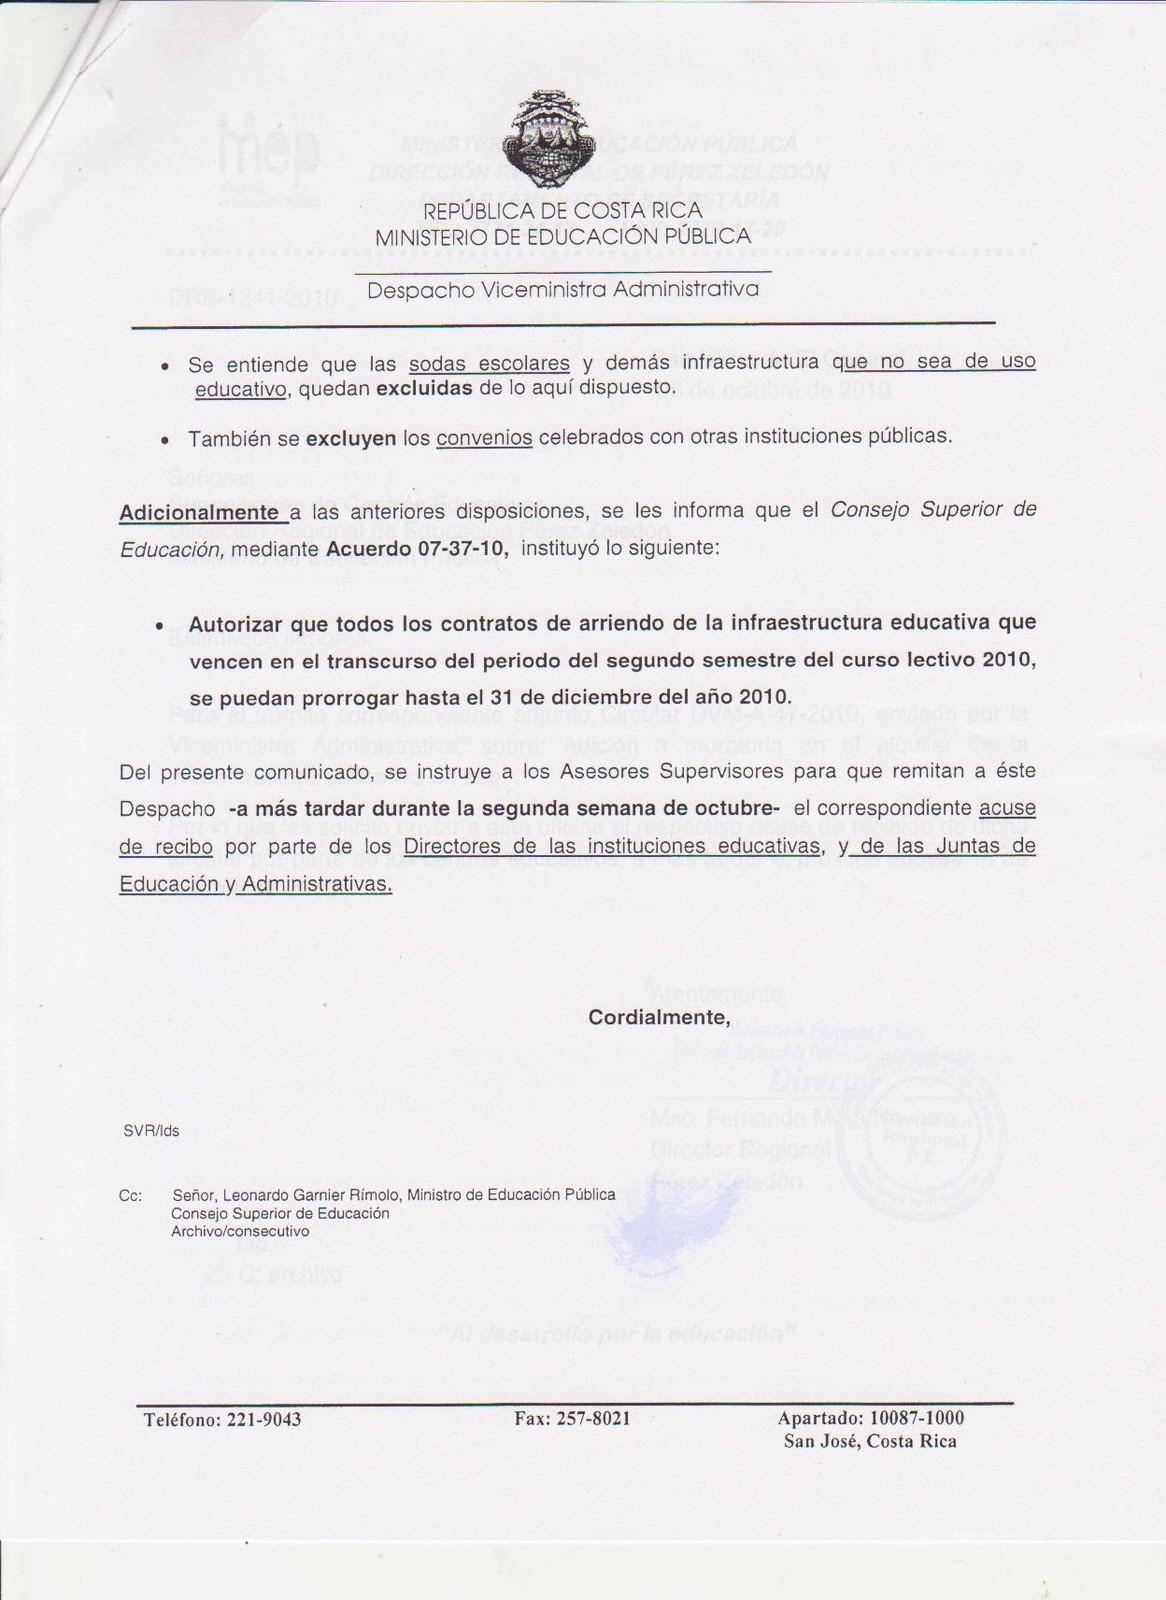 Formatos De Acuse De Recibo Best Of Acuse De Recibo Urgente